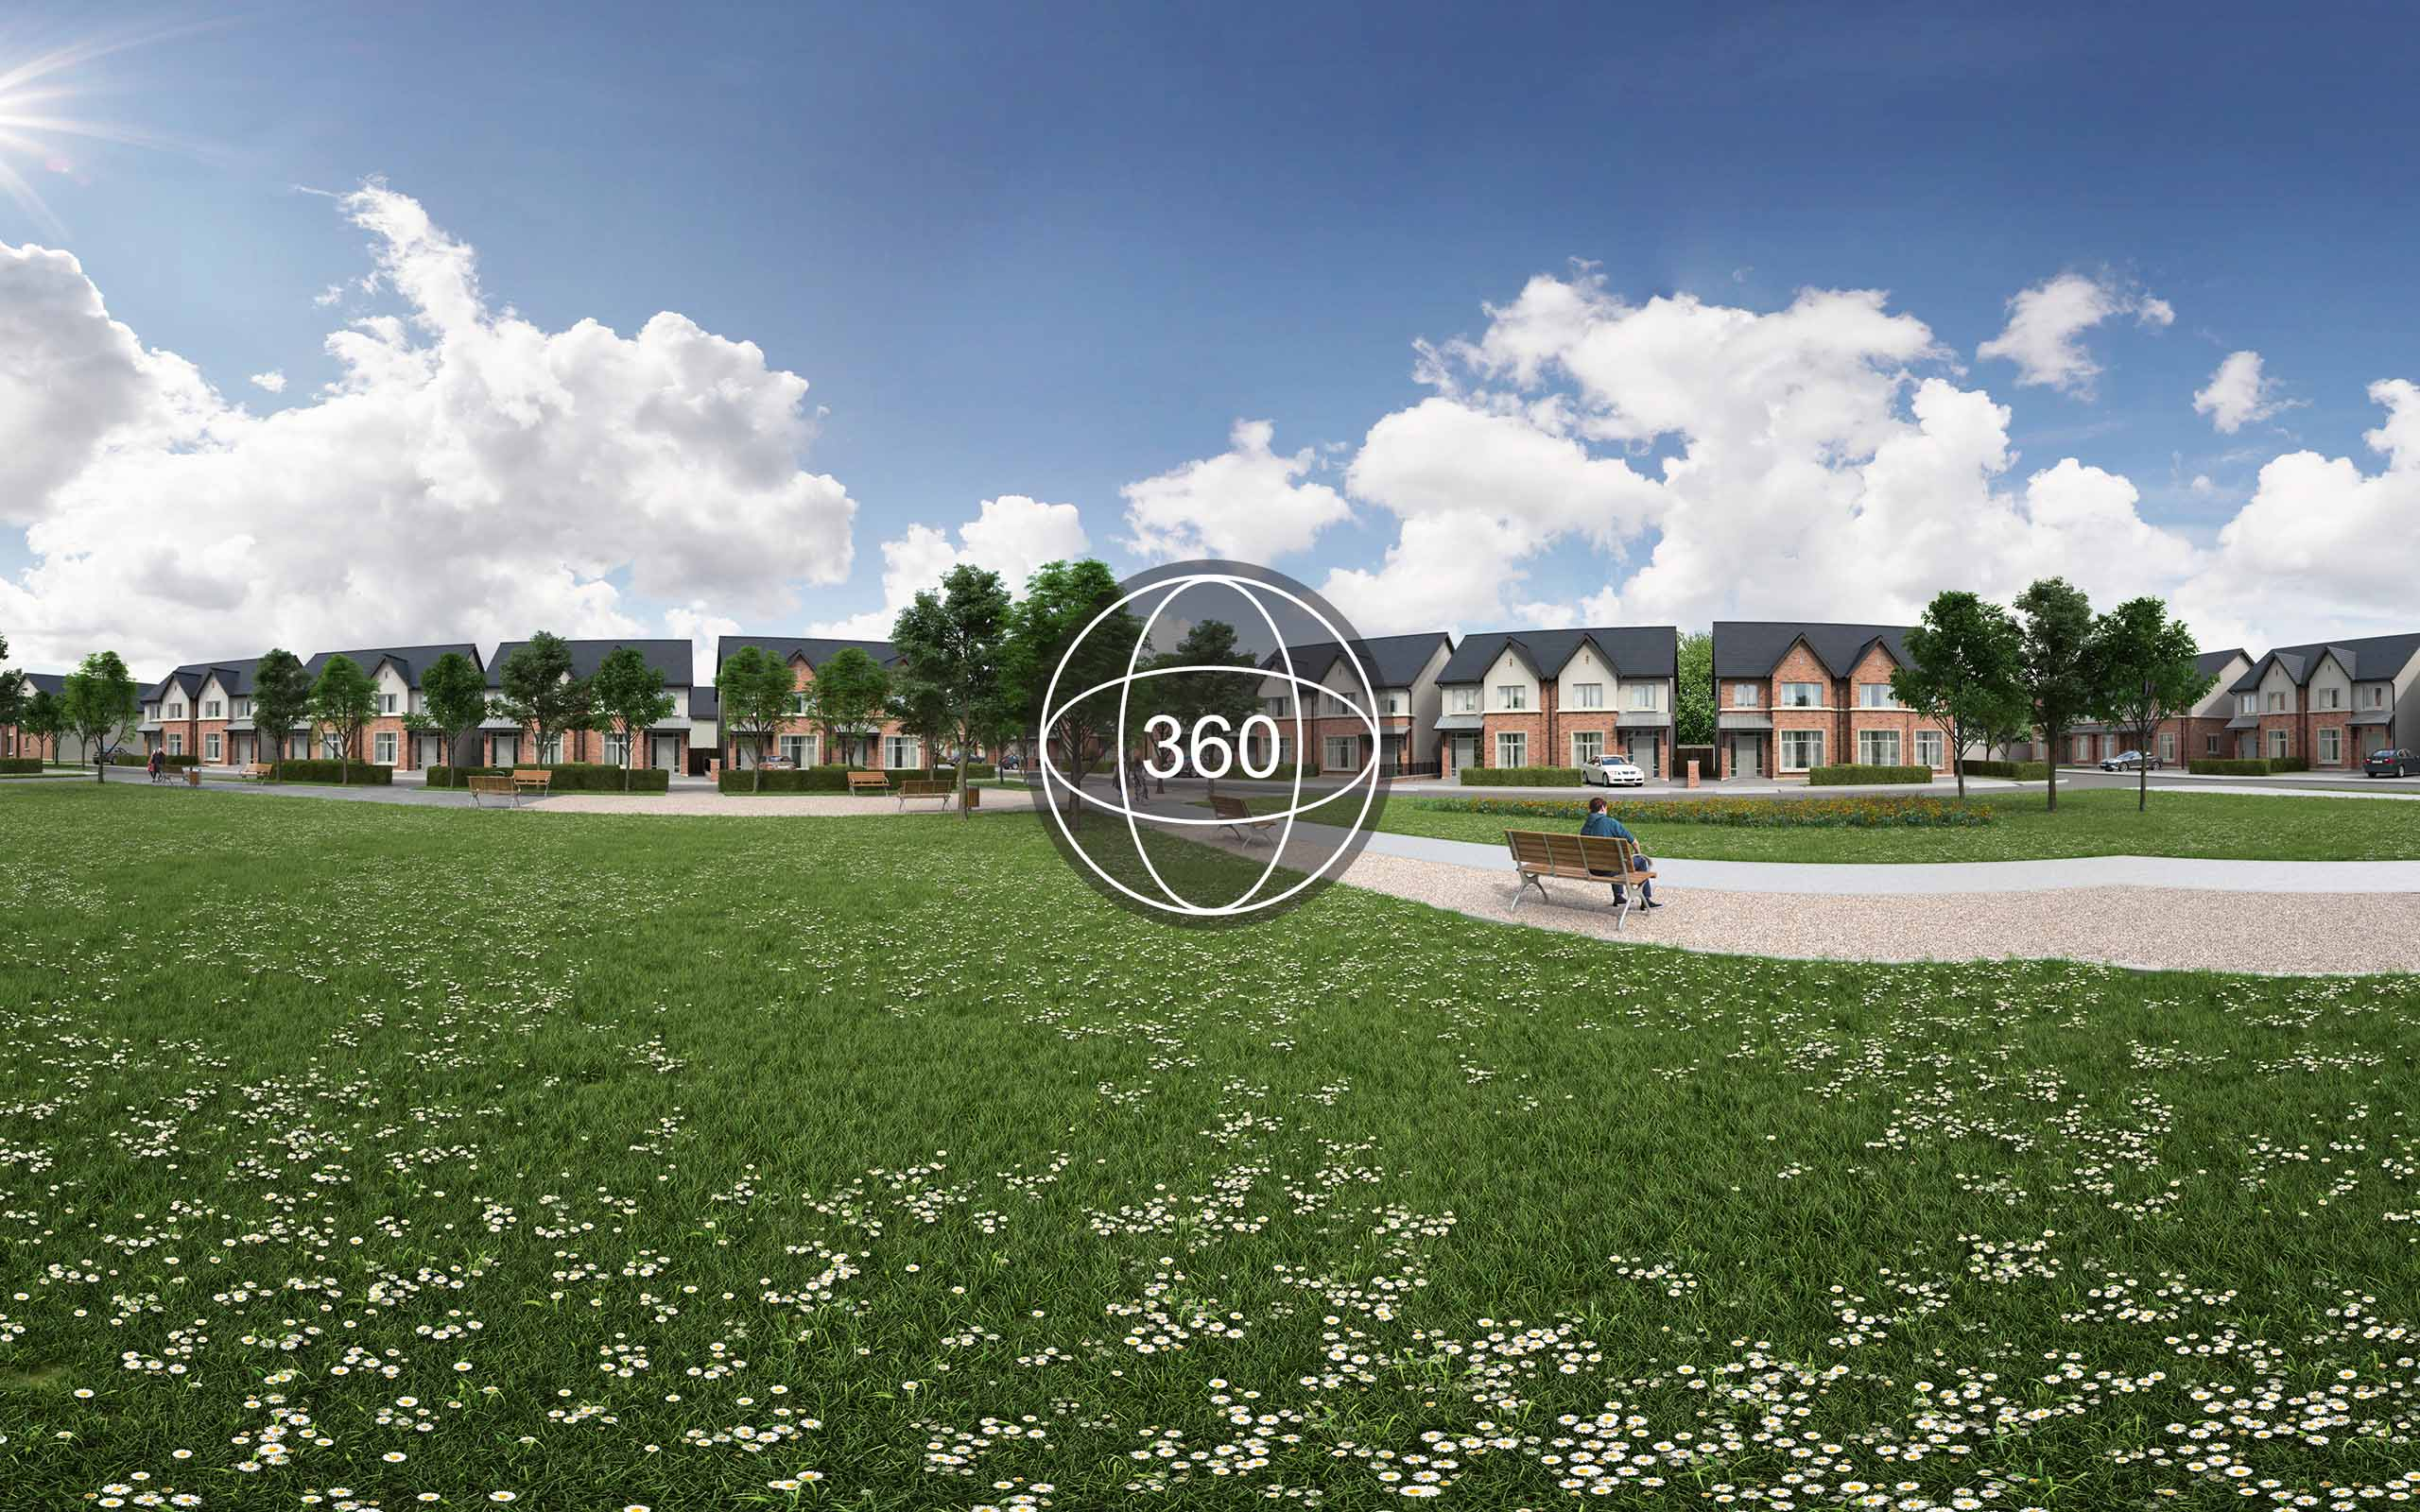 Off plans 360 virtual tour of Castlefarm housing development in Naas.